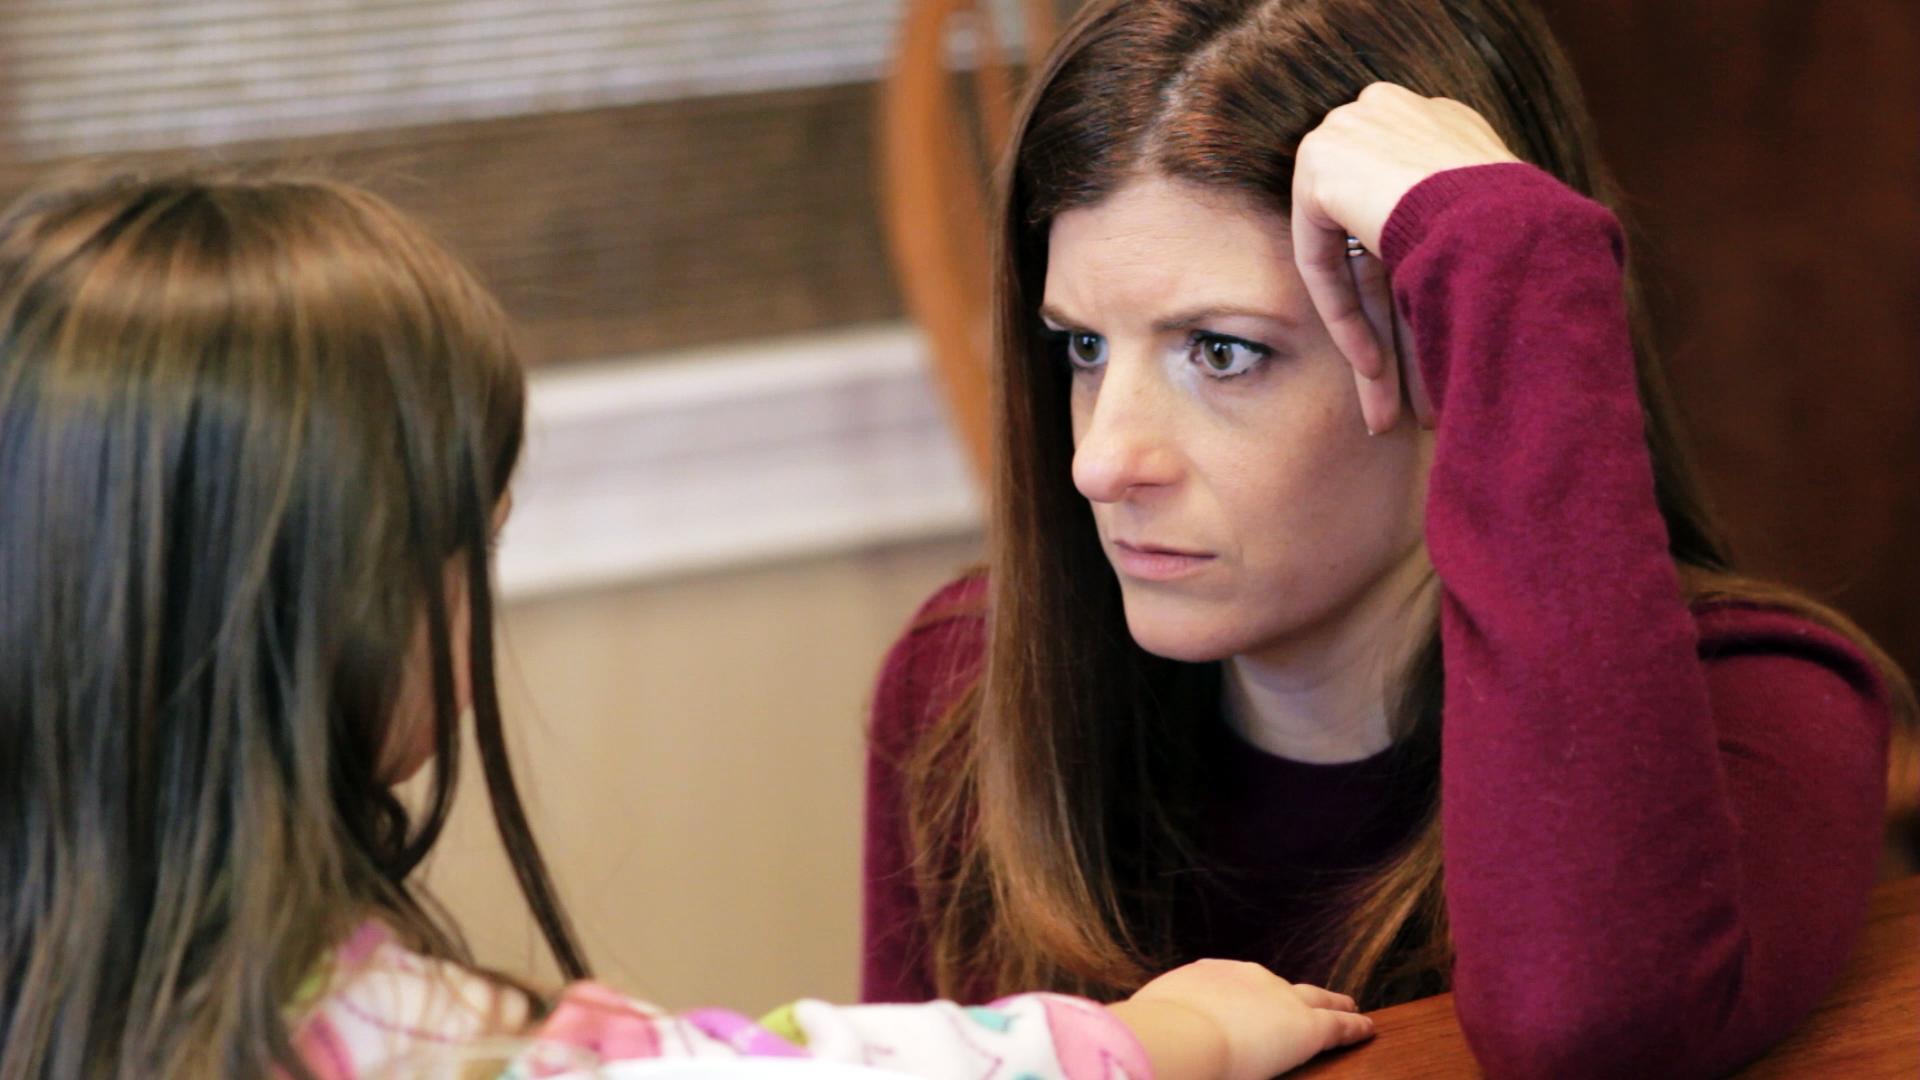 Isabella and Laura Putnam in Geena Matuson's (@geenamatuson) short film 'Ice Cream for Breakfast' (2013).